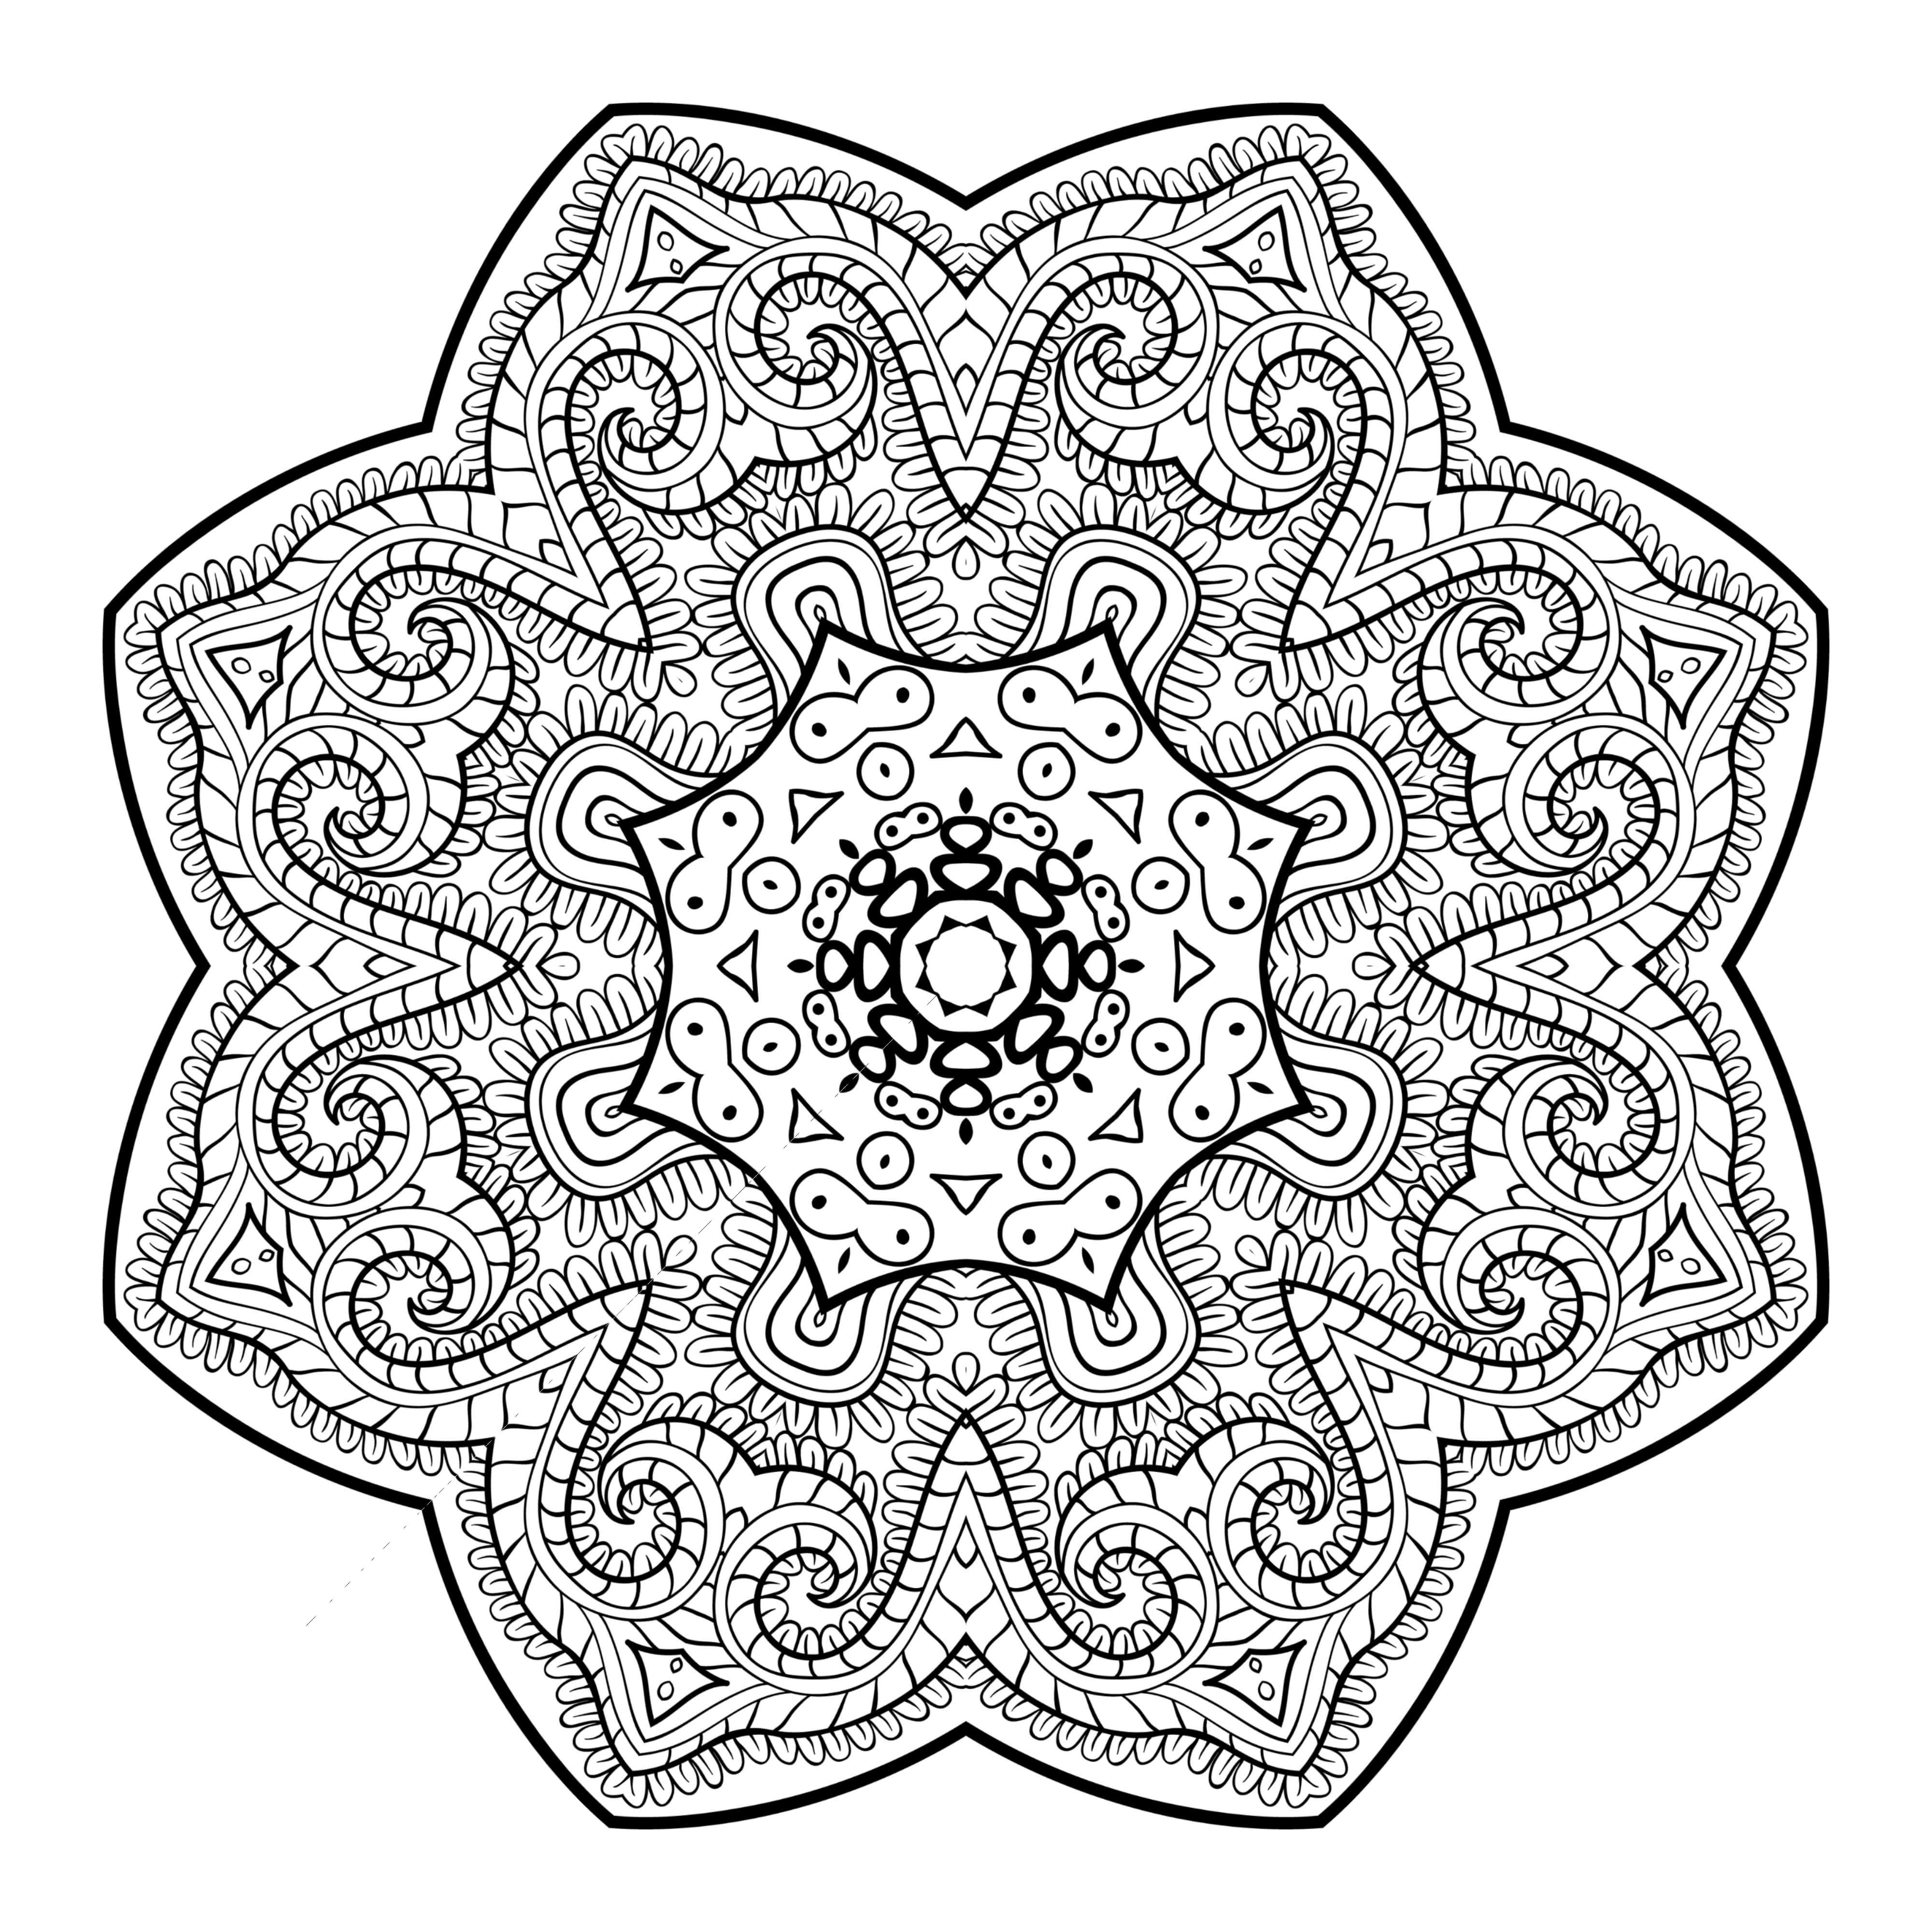 5 Free Printable Coloring Pages: Mandala Templates | Free ...